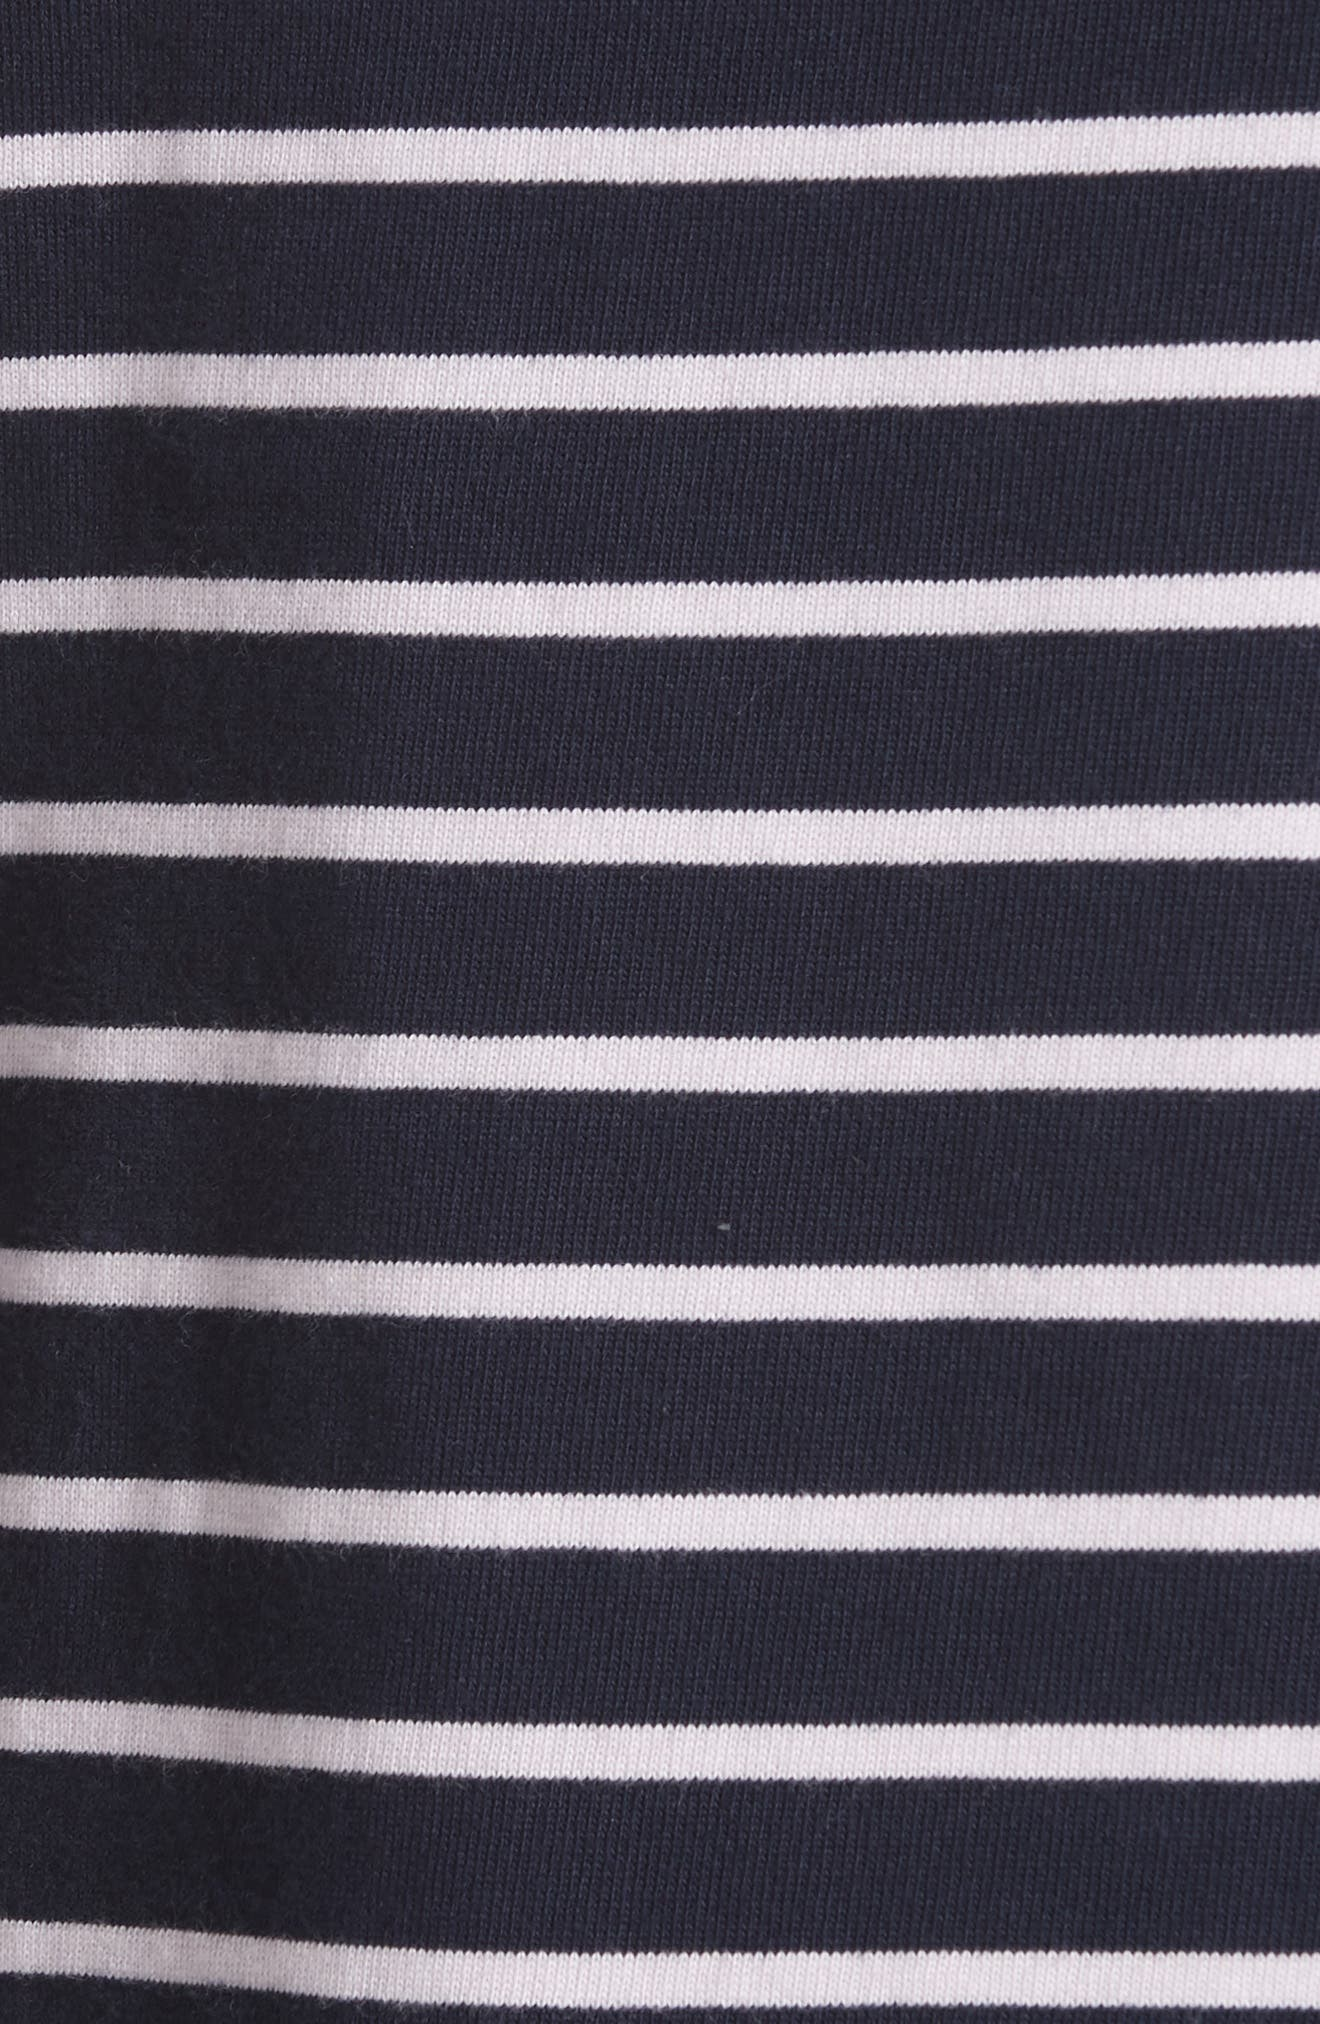 Stripe Top,                             Alternate thumbnail 5, color,